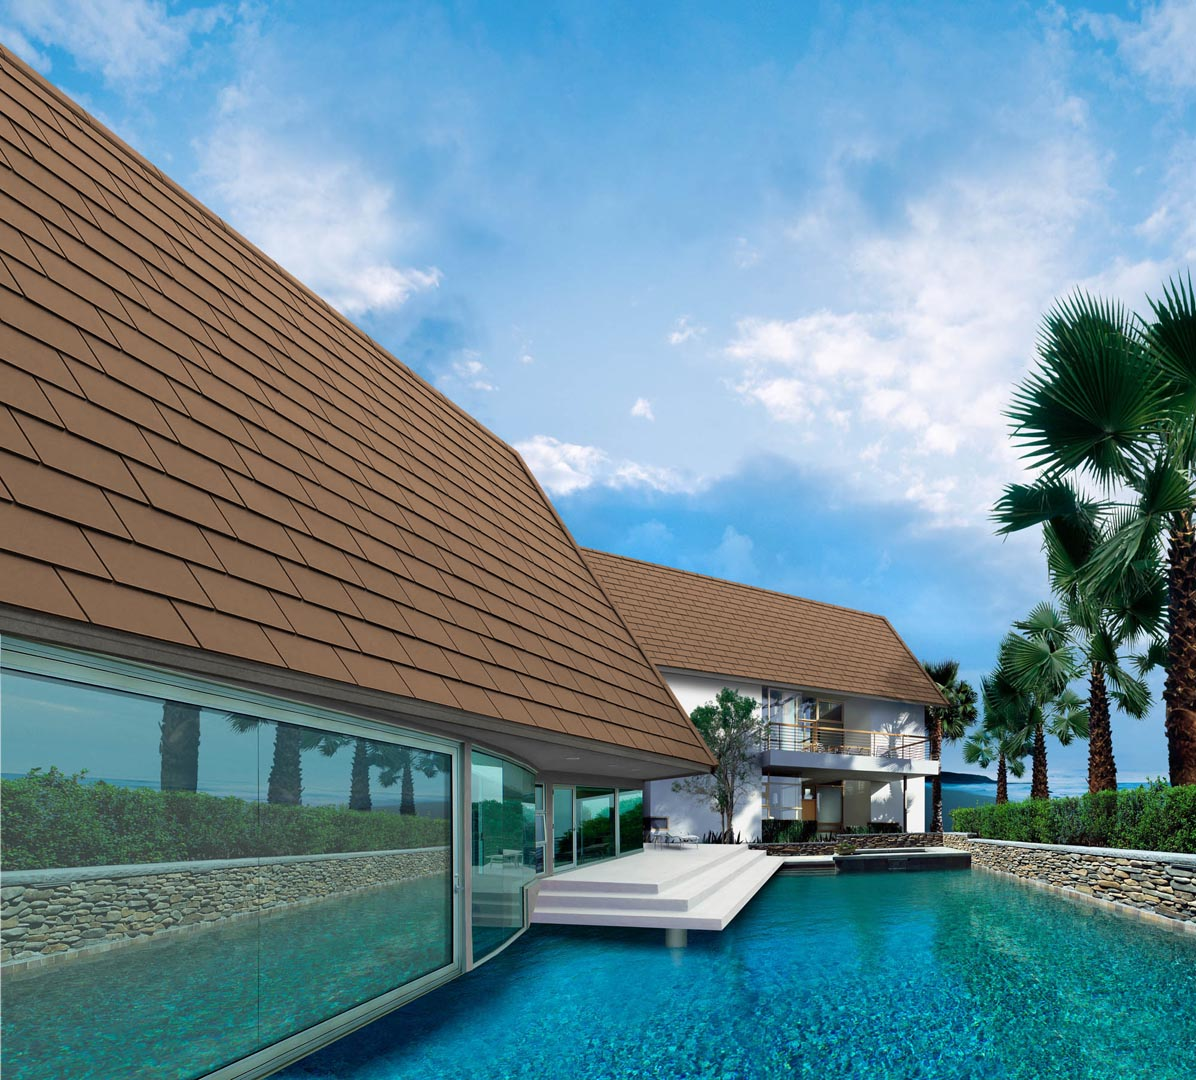 SCG-Fiber-Cement-Roof-Ayara-Modern-Sandy-Brown-site-reference